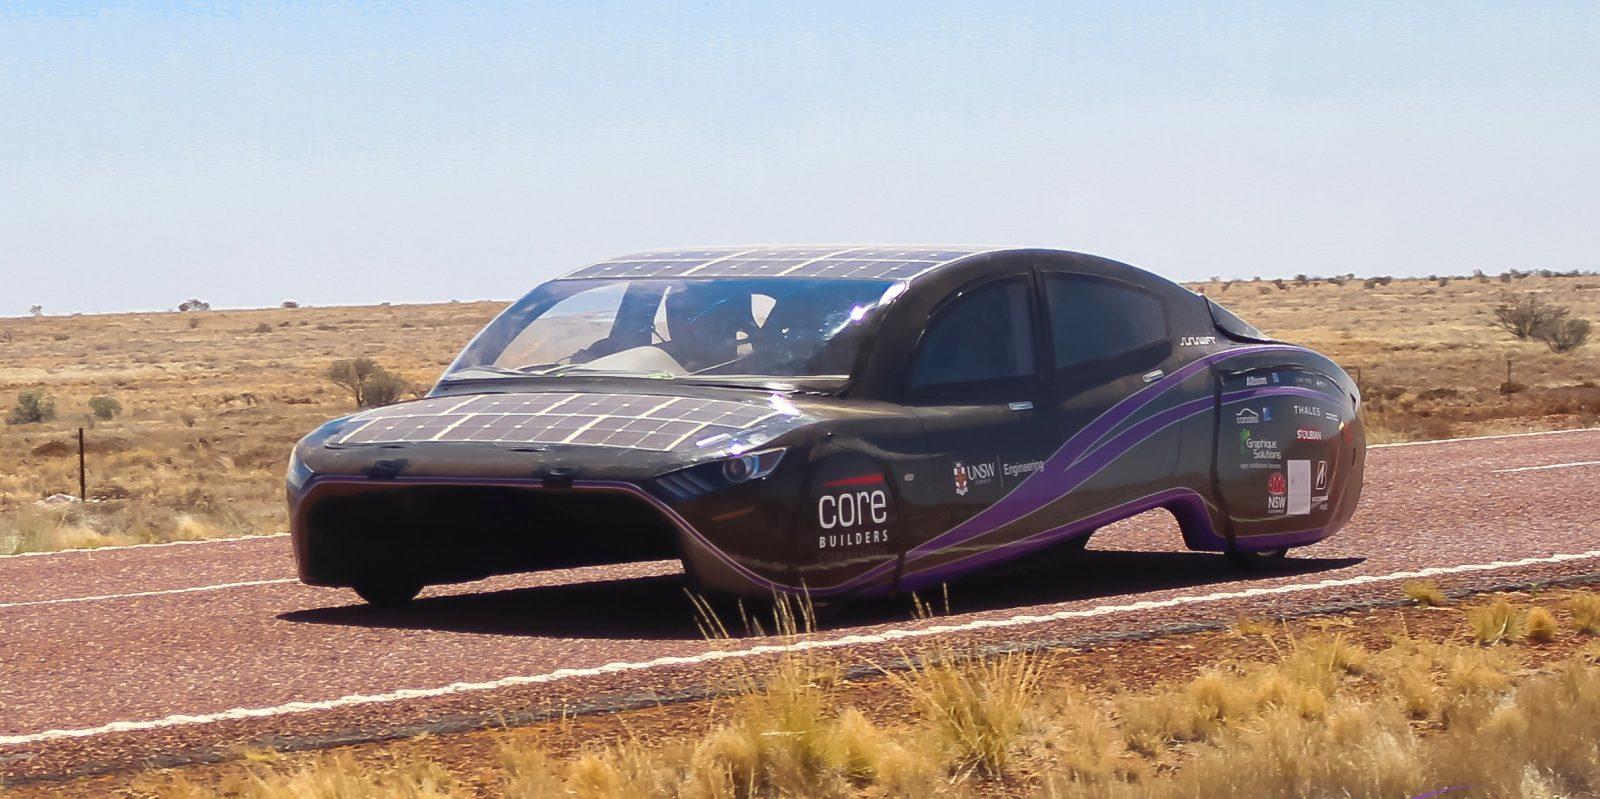 Solar-powered car breaks world record in efficiency during 4,100 km Australian trip